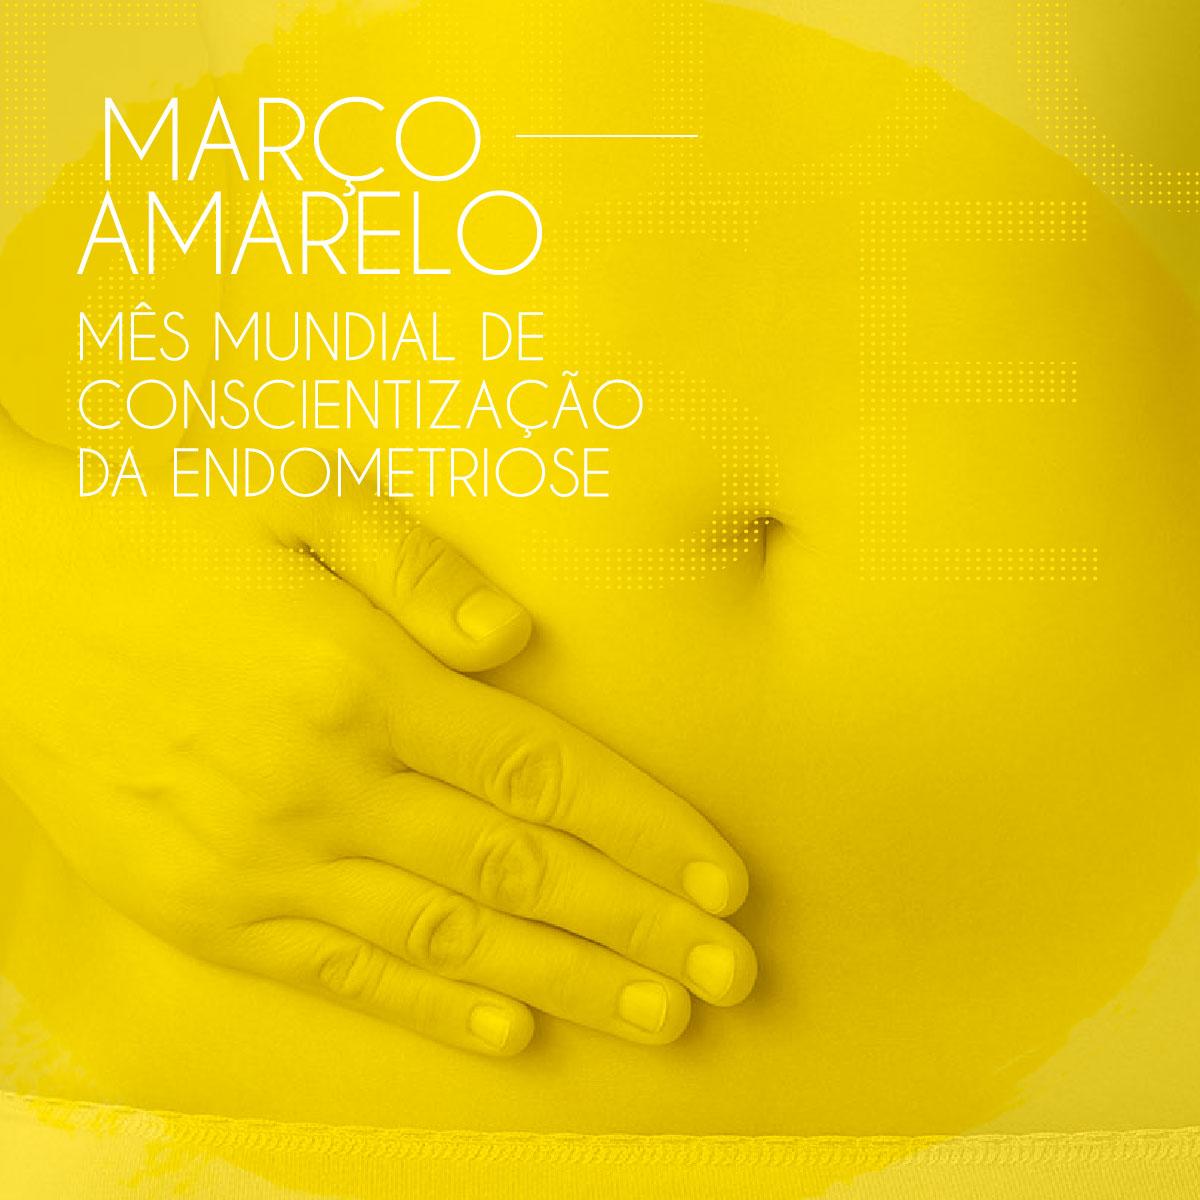 Março Amarelo - Endometriose